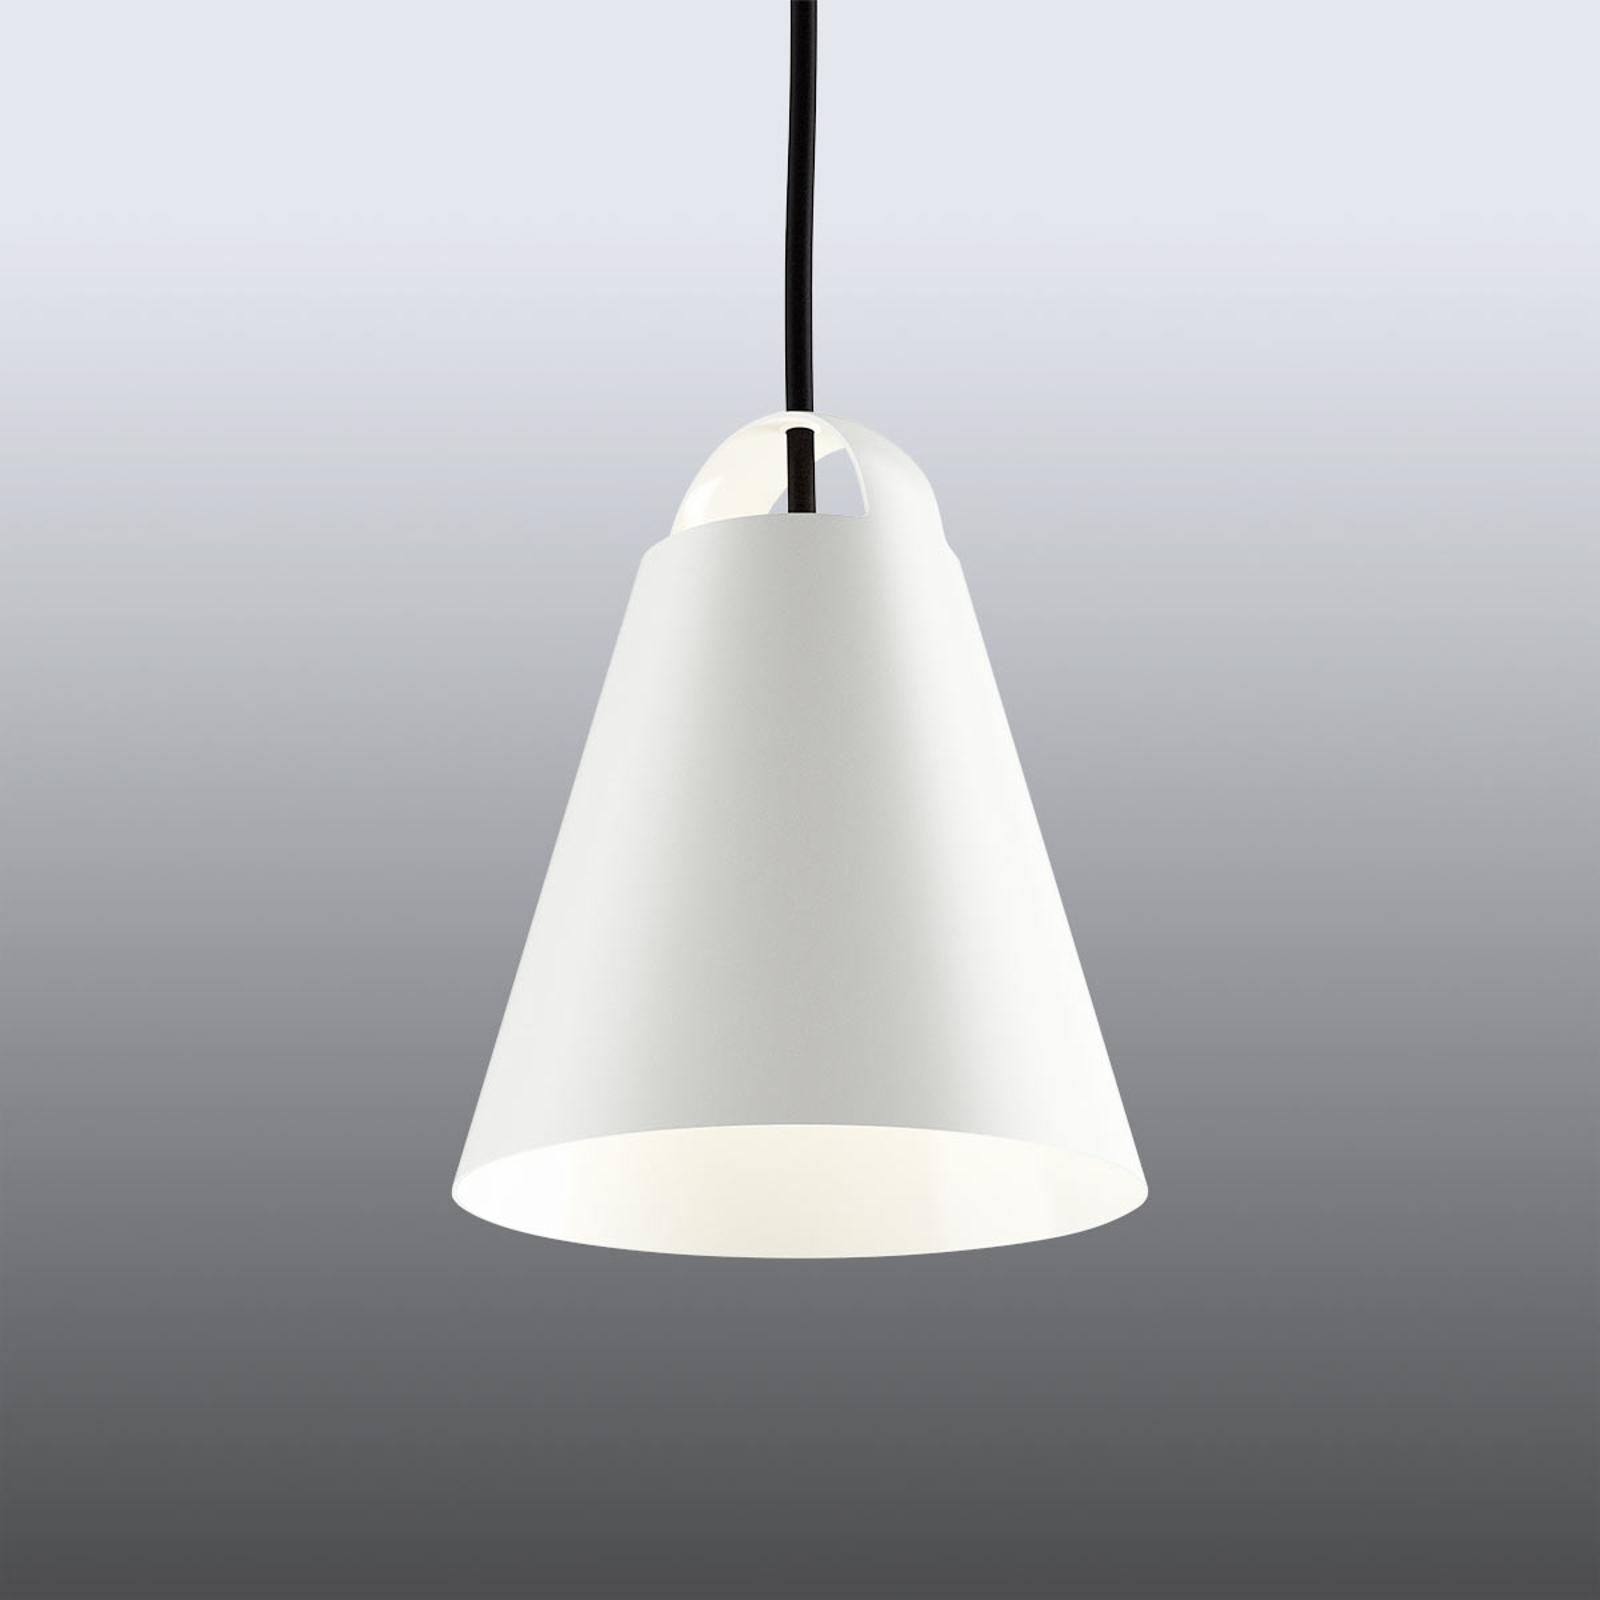 Acquista Louis Poulsen Above lampada a sospensione, bianca